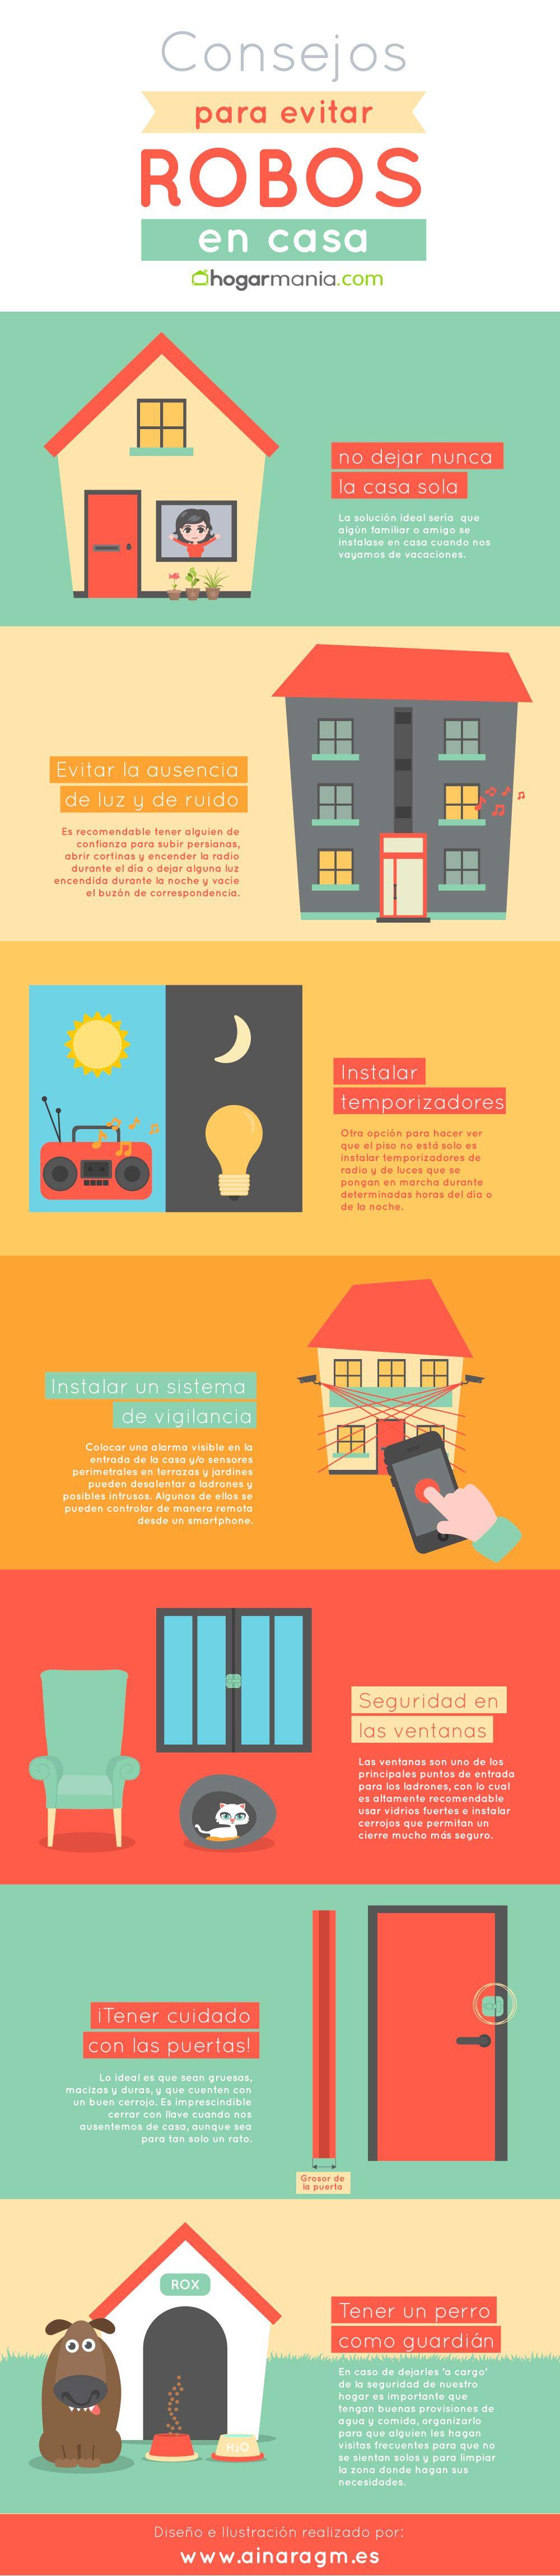 Infograf a 7 consejos para proteger tu casa de robos en for Consejos para remodelar tu casa